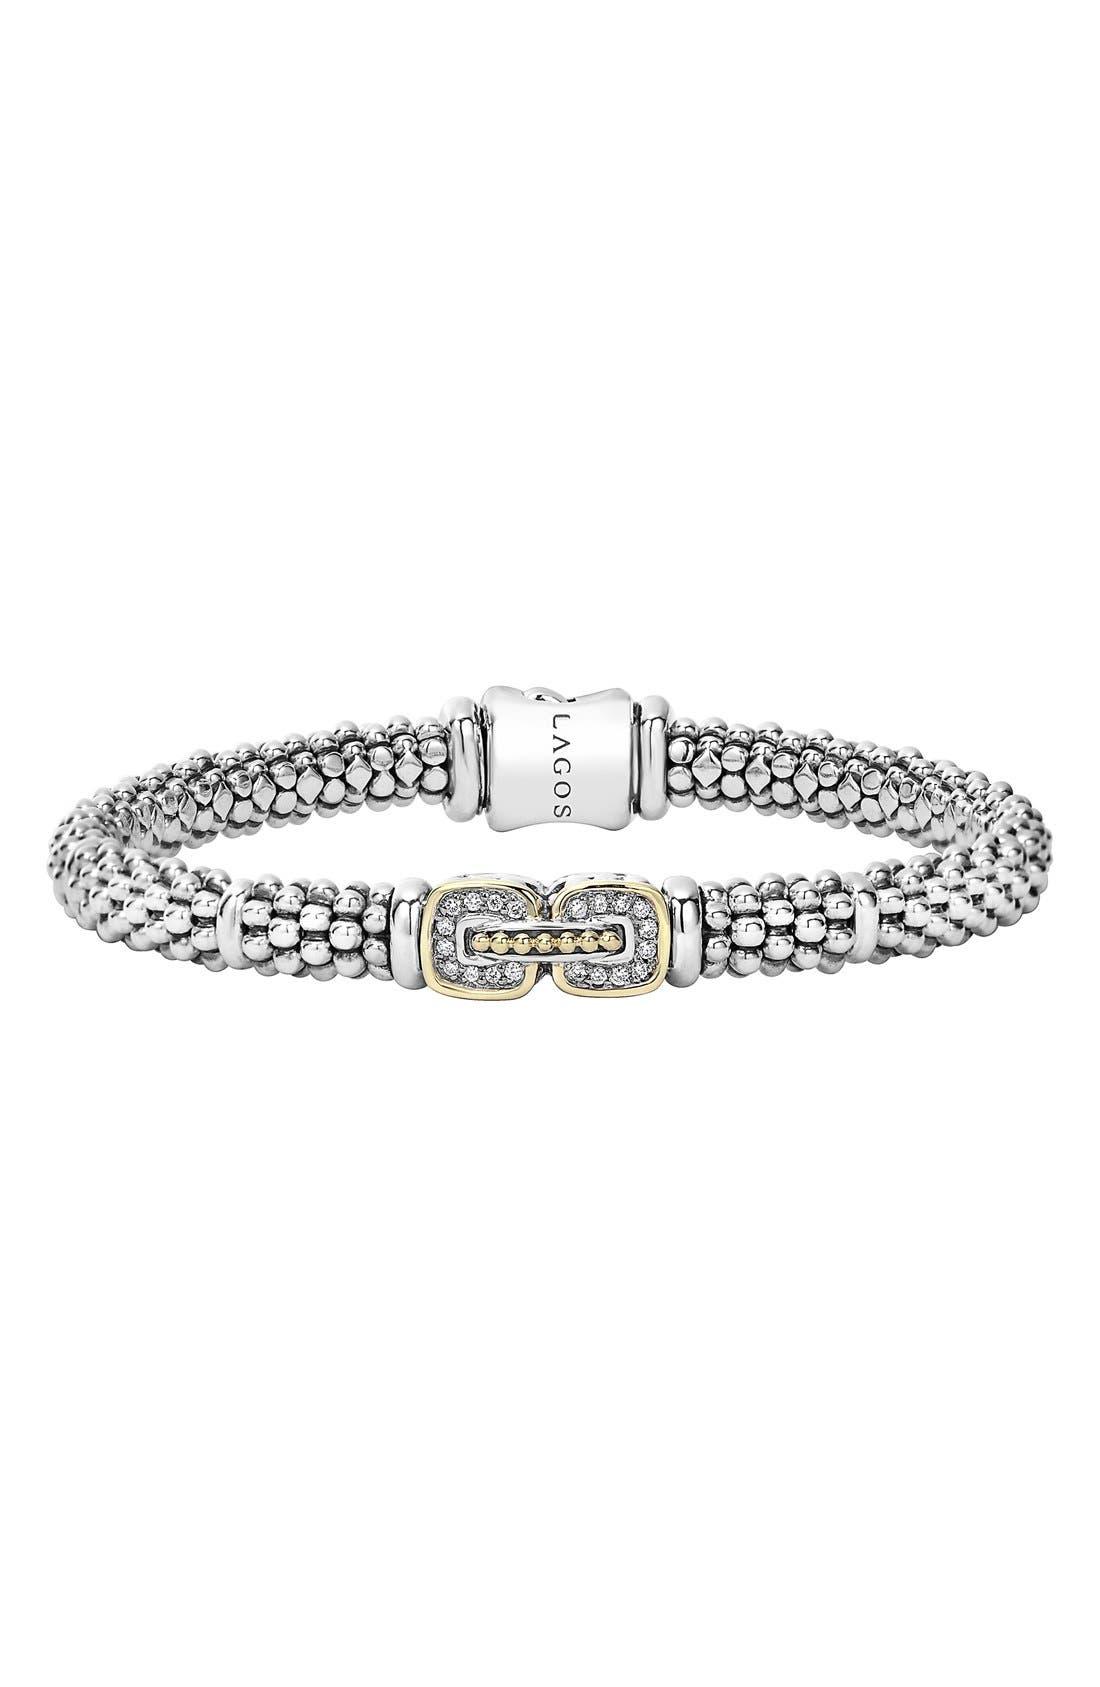 'Cushion' Diamond Caviar Bracelet,                         Main,                         color, SILVER/ GOLD